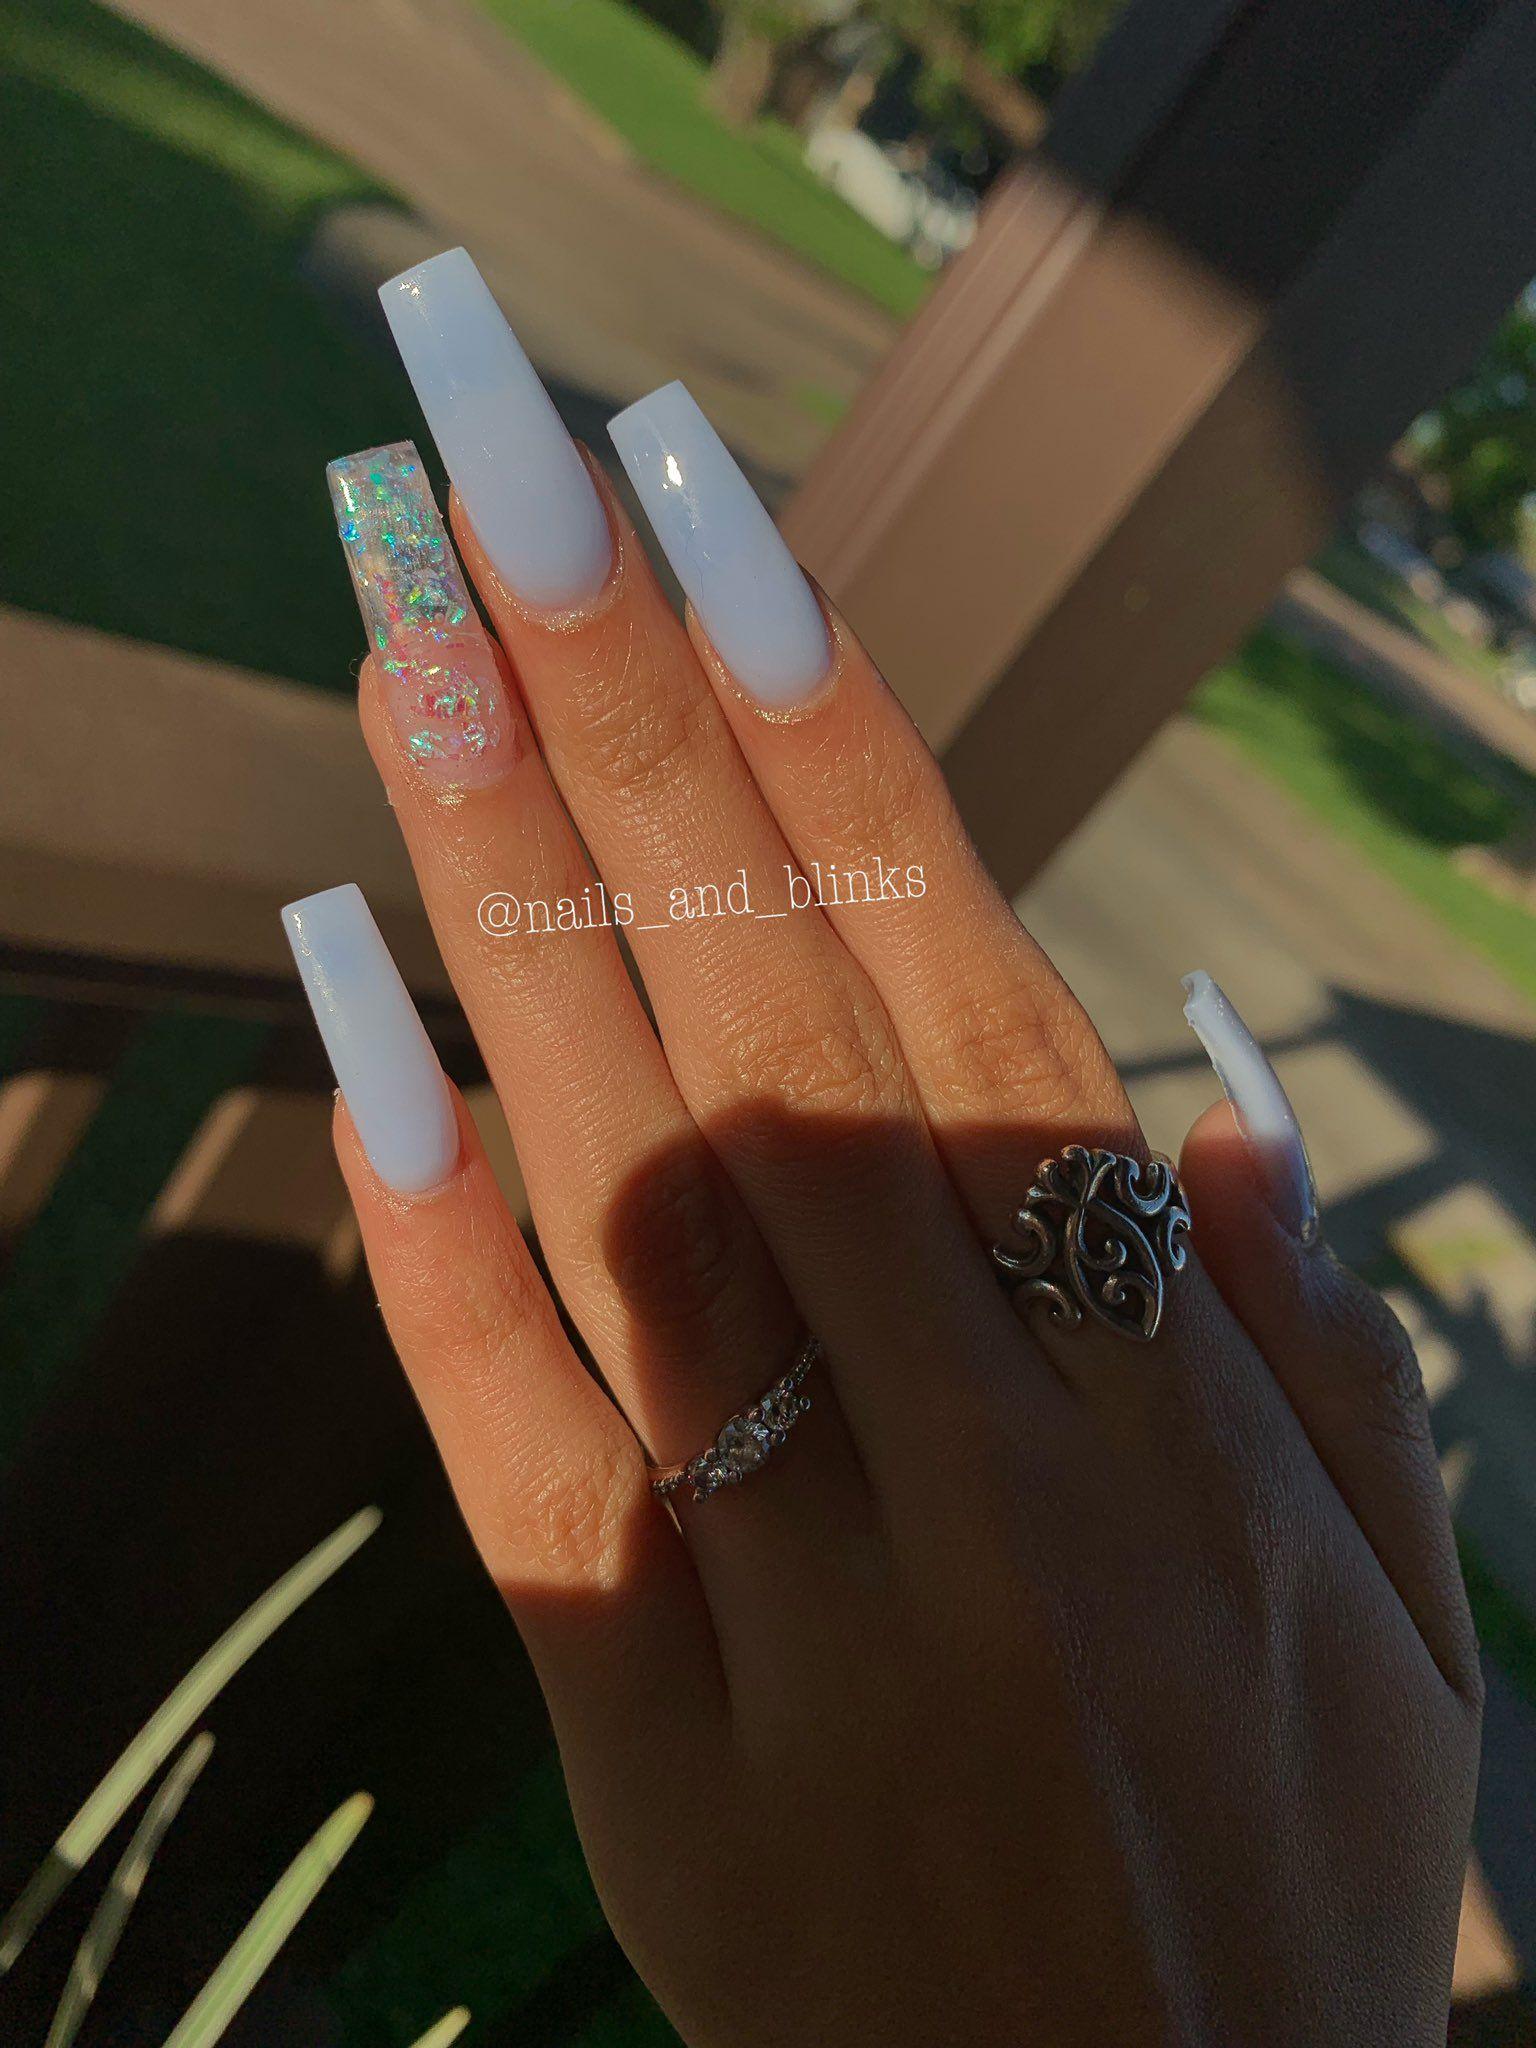 Valeria On Twitter Blue Acrylic Nails Square Acrylic Nails Clear Acrylic Nails